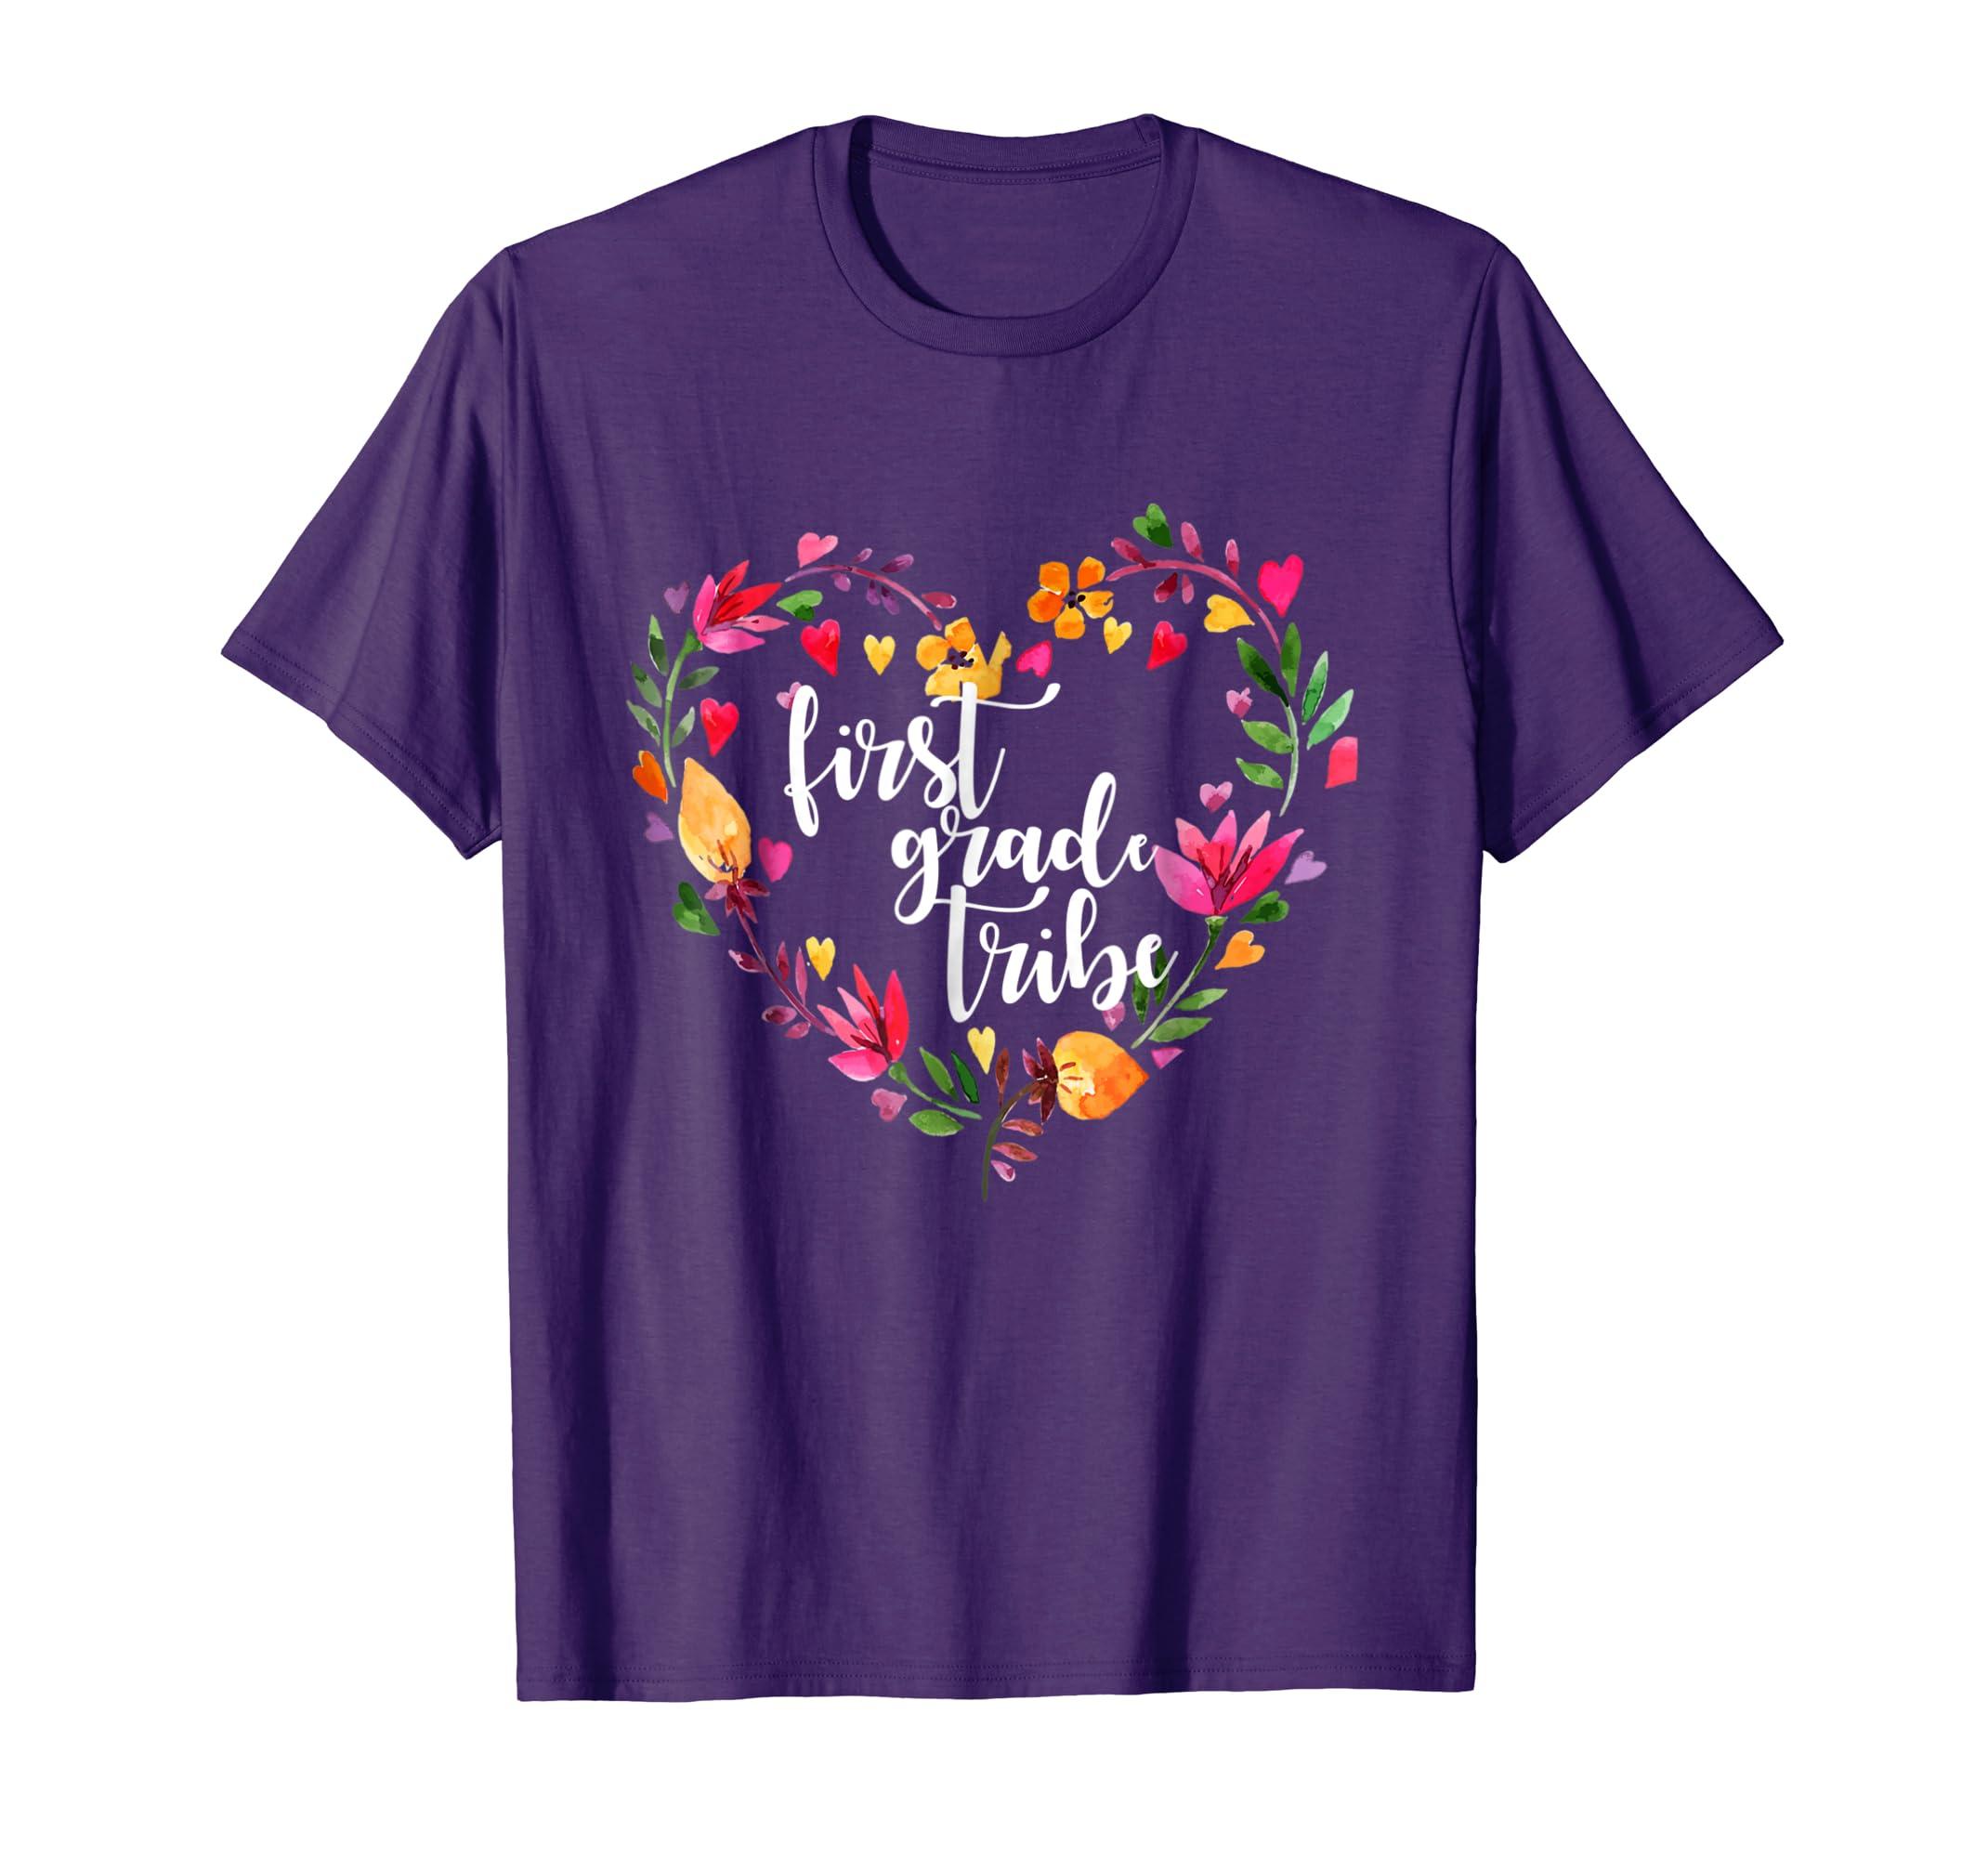 Tribe Back to school T shirt Flower wreath shirt-Awarplus